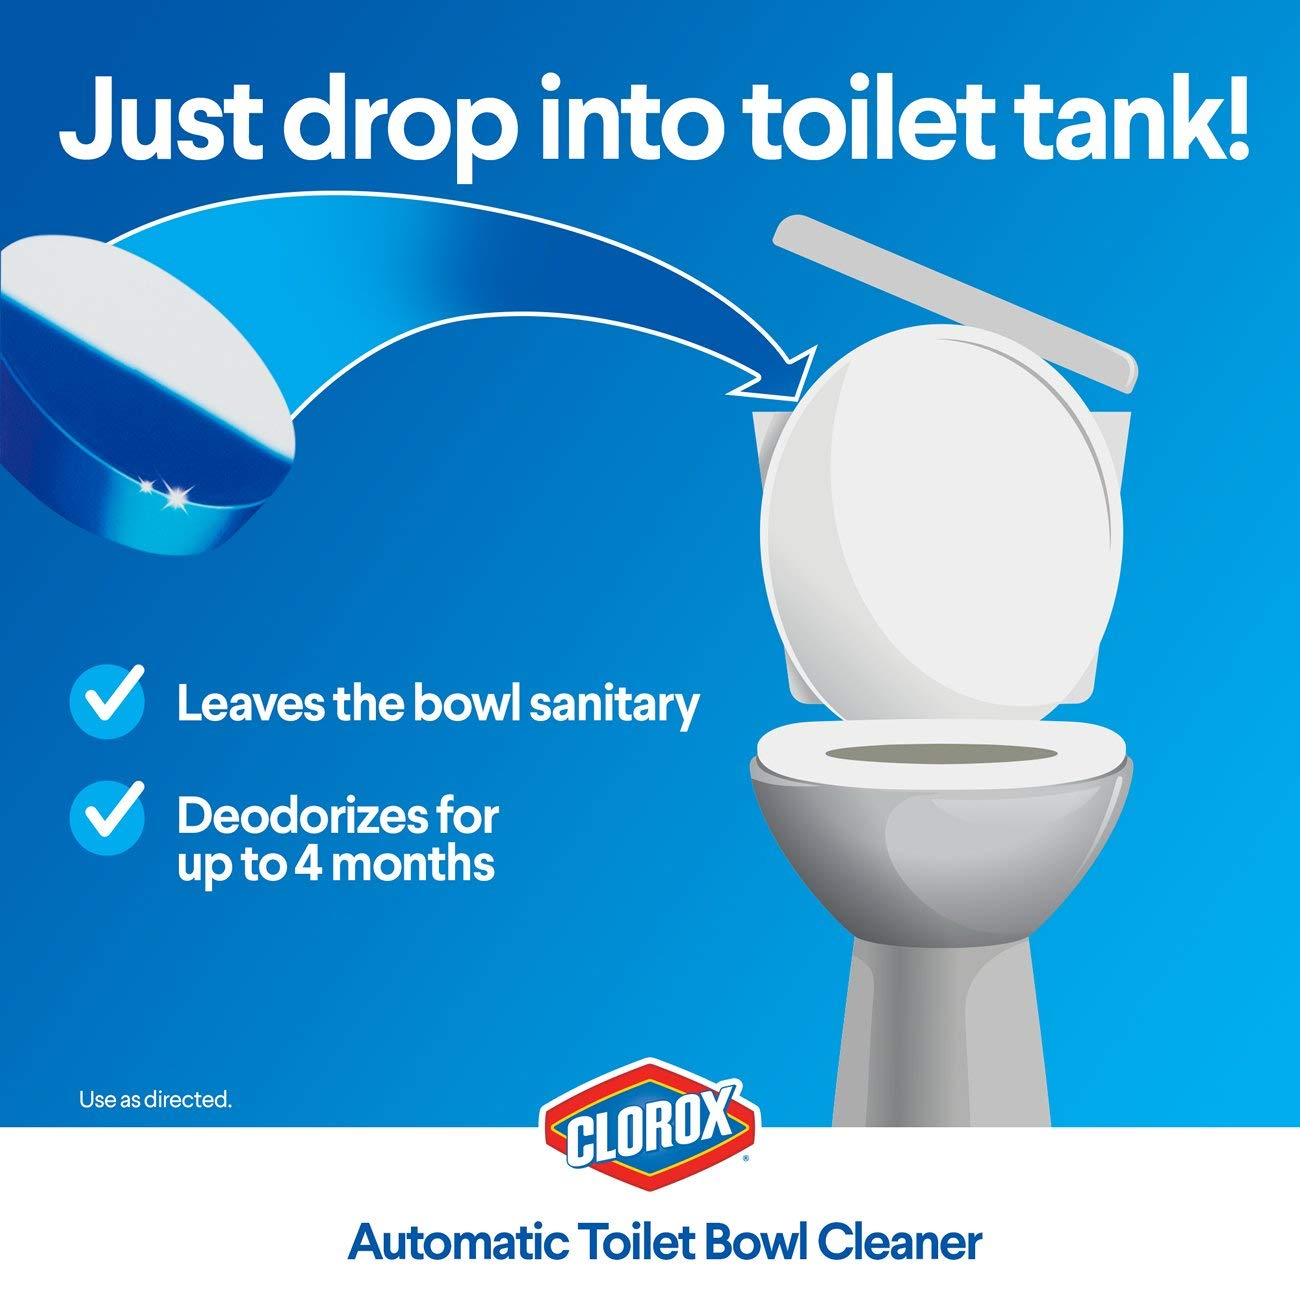 Miraculous Clorox Automatic Toilet Bowl Cleaner Tablets Bleach Blue Rain Clean 4 Count Beatyapartments Chair Design Images Beatyapartmentscom